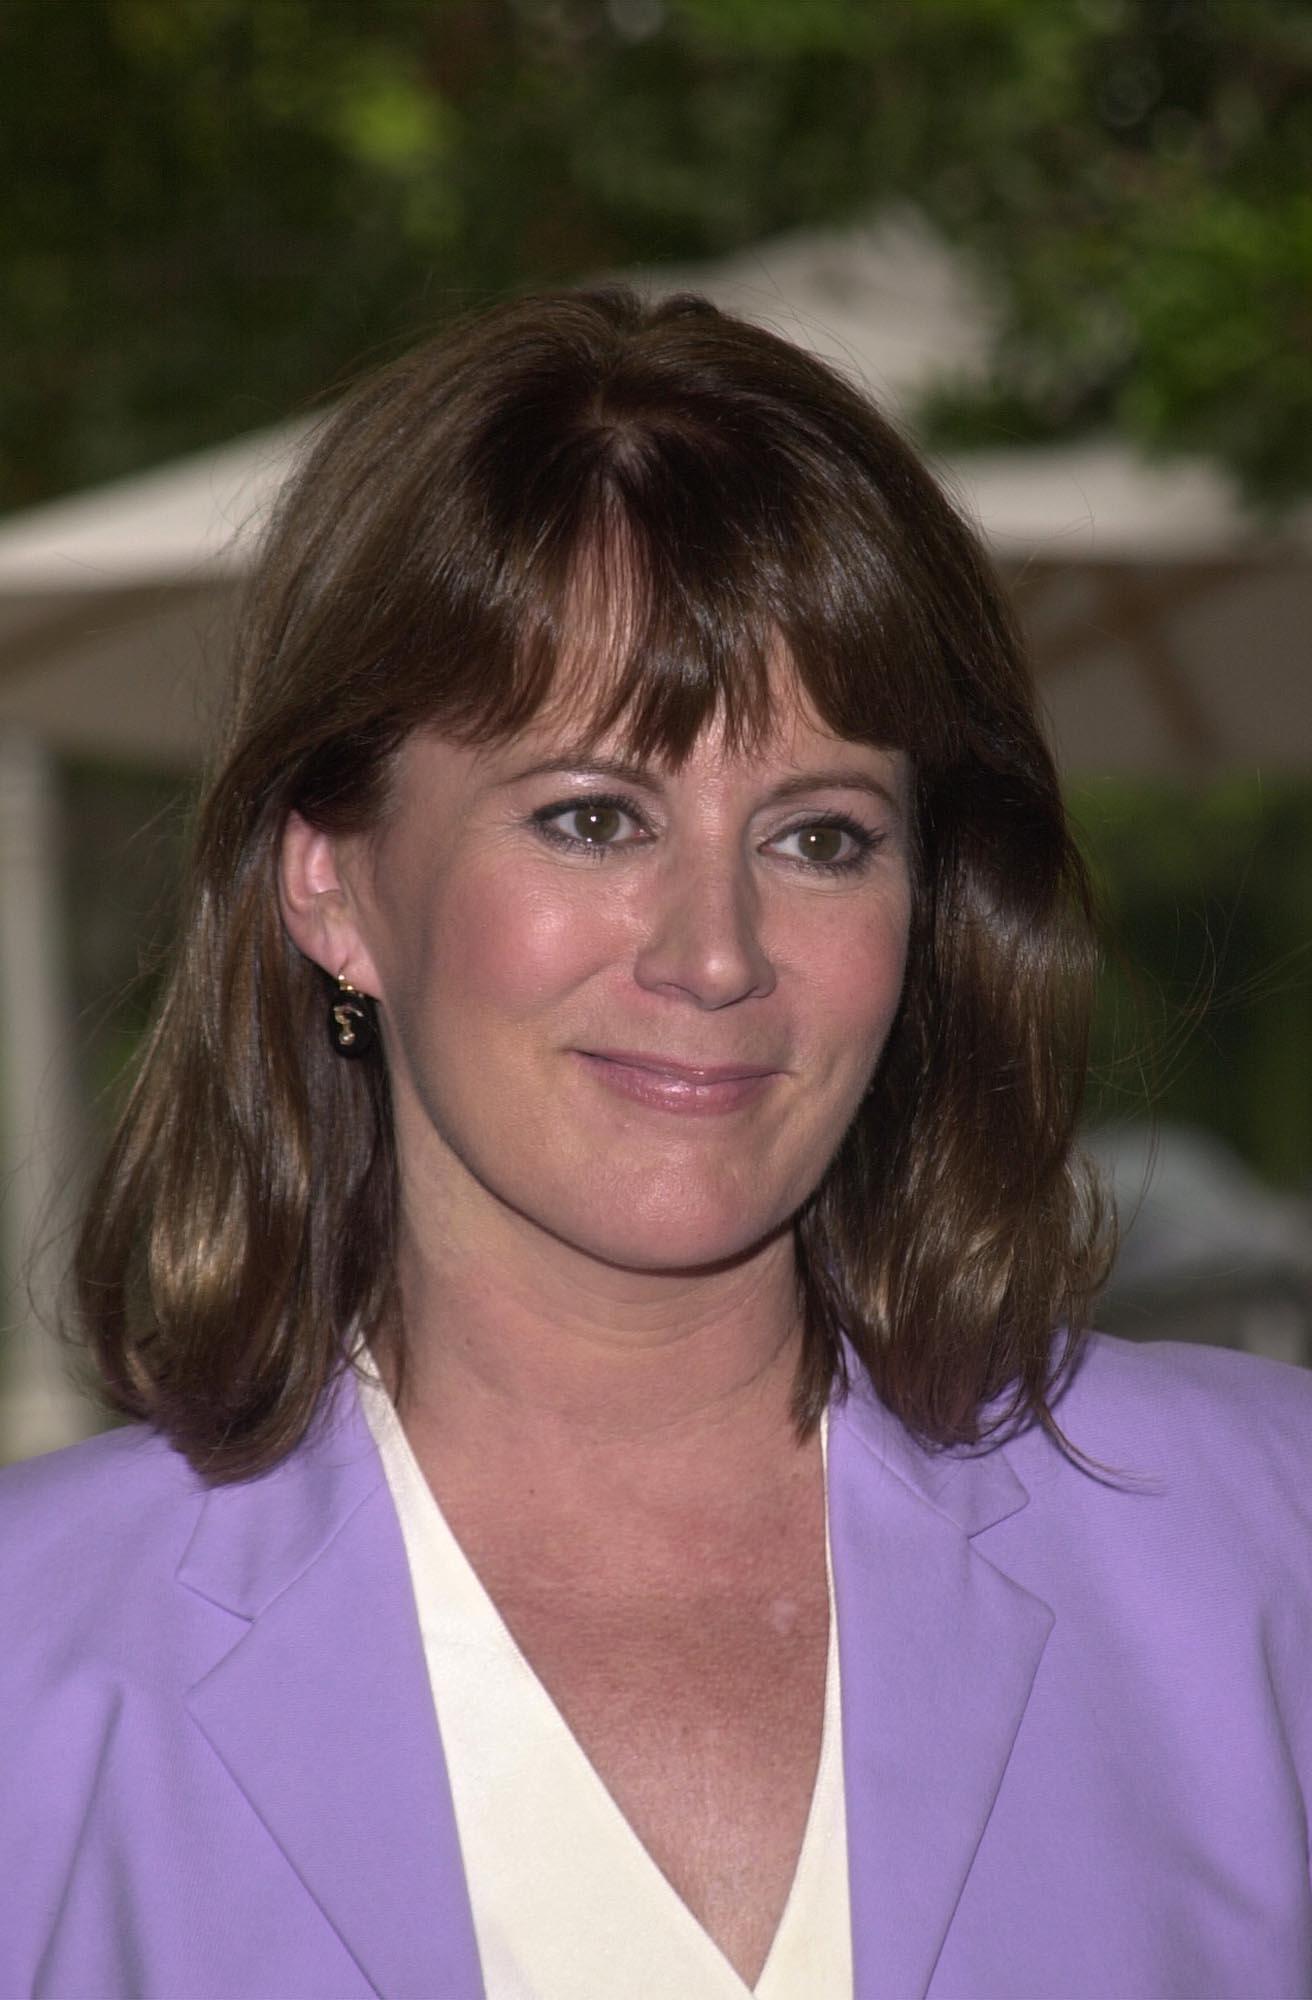 Patricia Richardson Patricia Richardson - -Patricia-Richardson-patricia-richardson-32687106-1312-2000